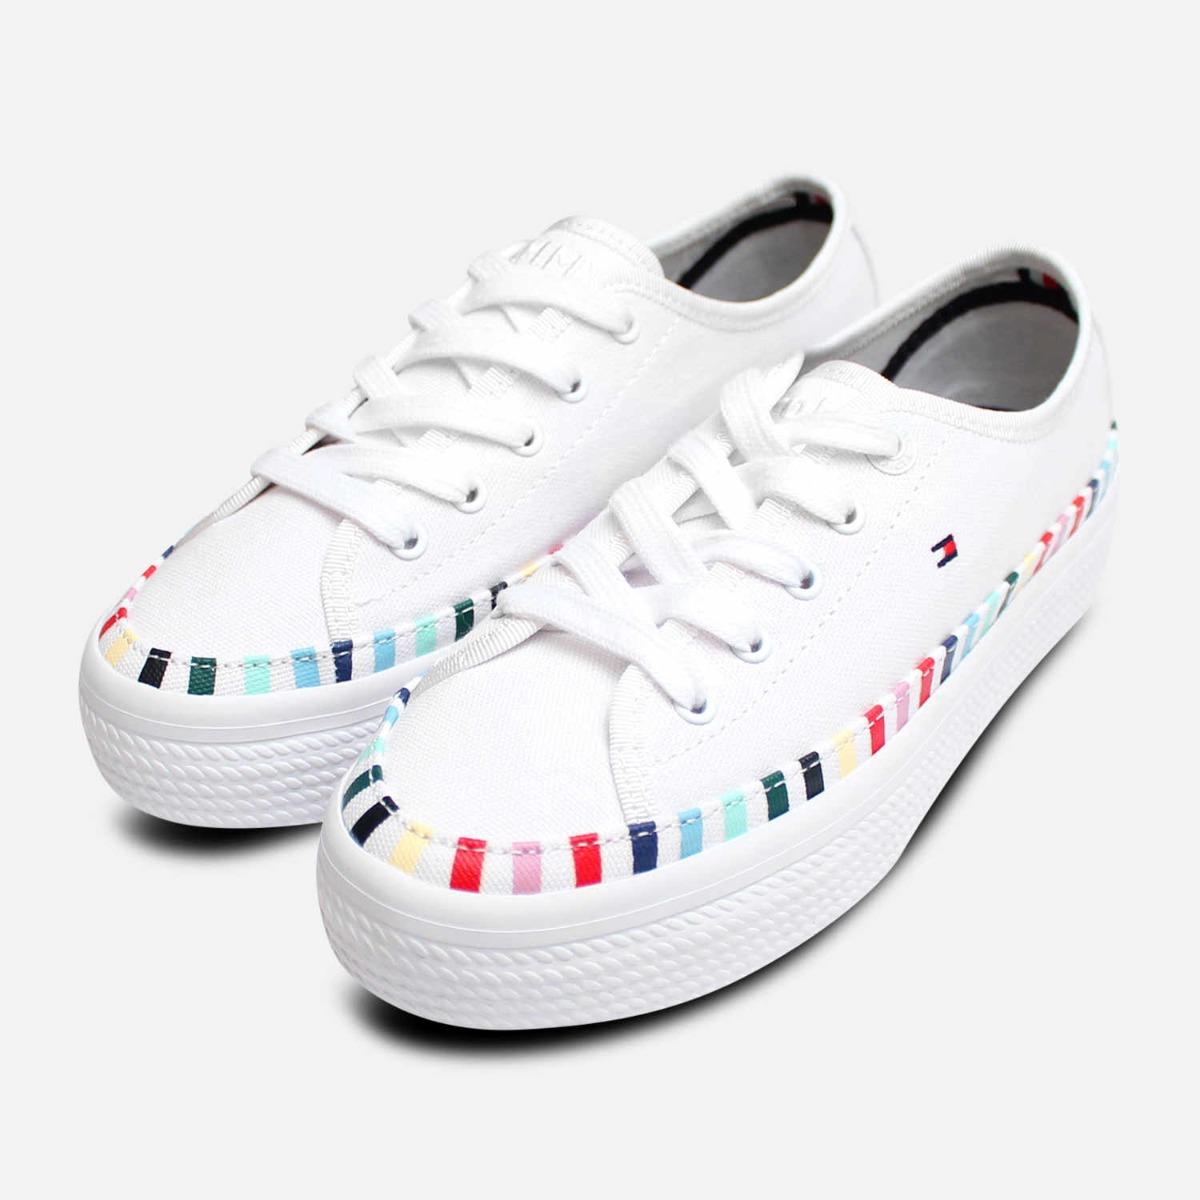 Tommy Hilfiger Women's Slip on Rainbow Flatform Low-Top Sneaker